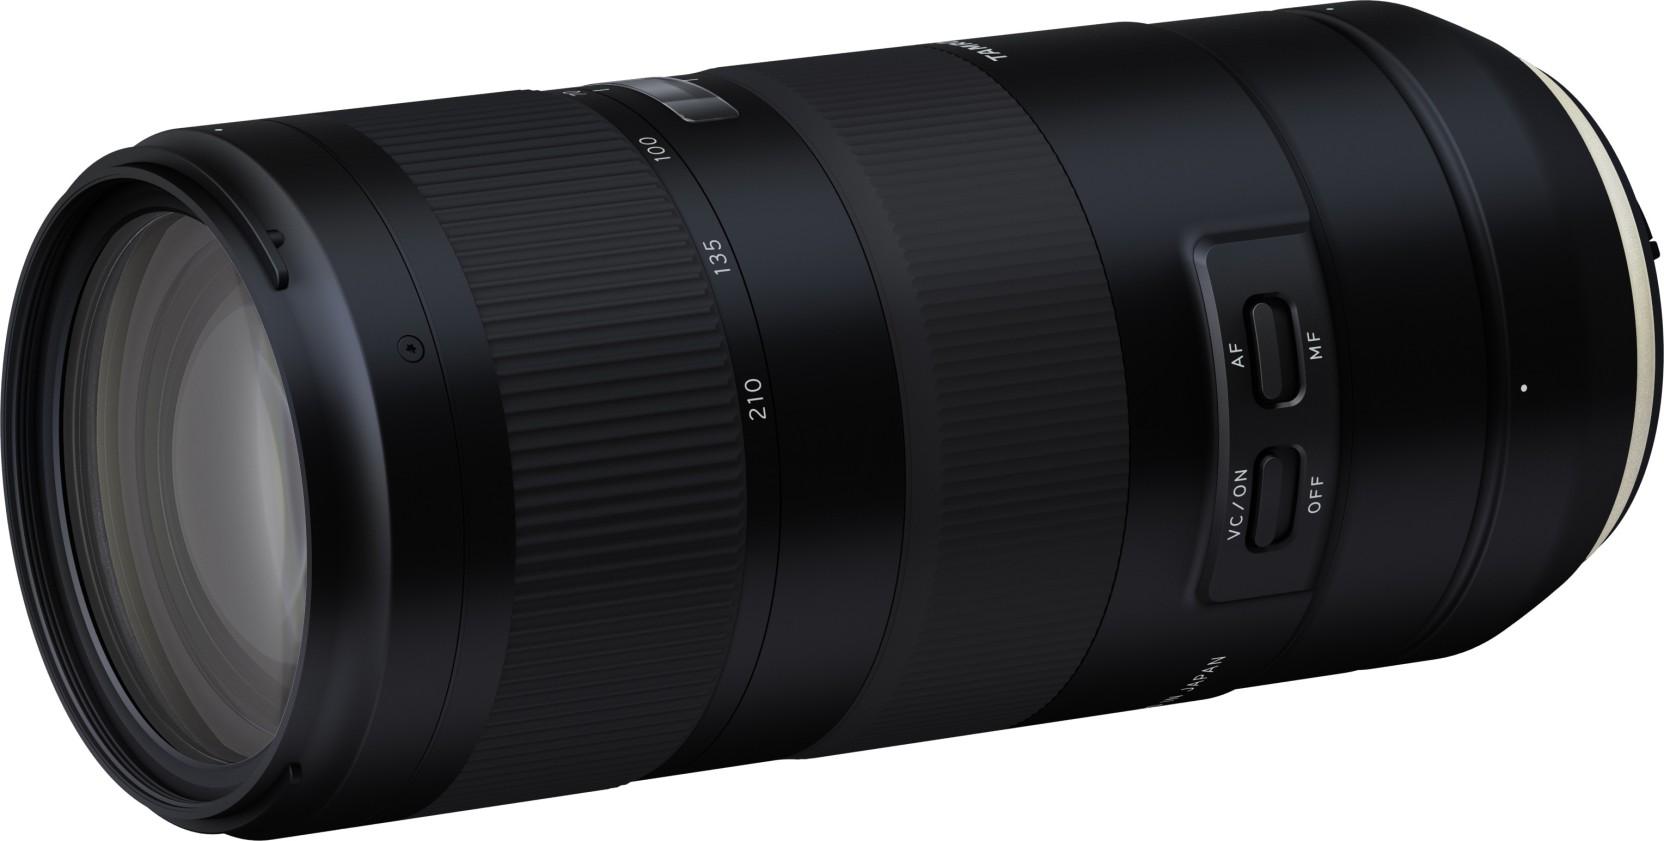 Tamron Sp 70 210mm F 4 Di Vc Usd Lens For Nikon Dslr Camera 300mm F4 56 Add To Cart